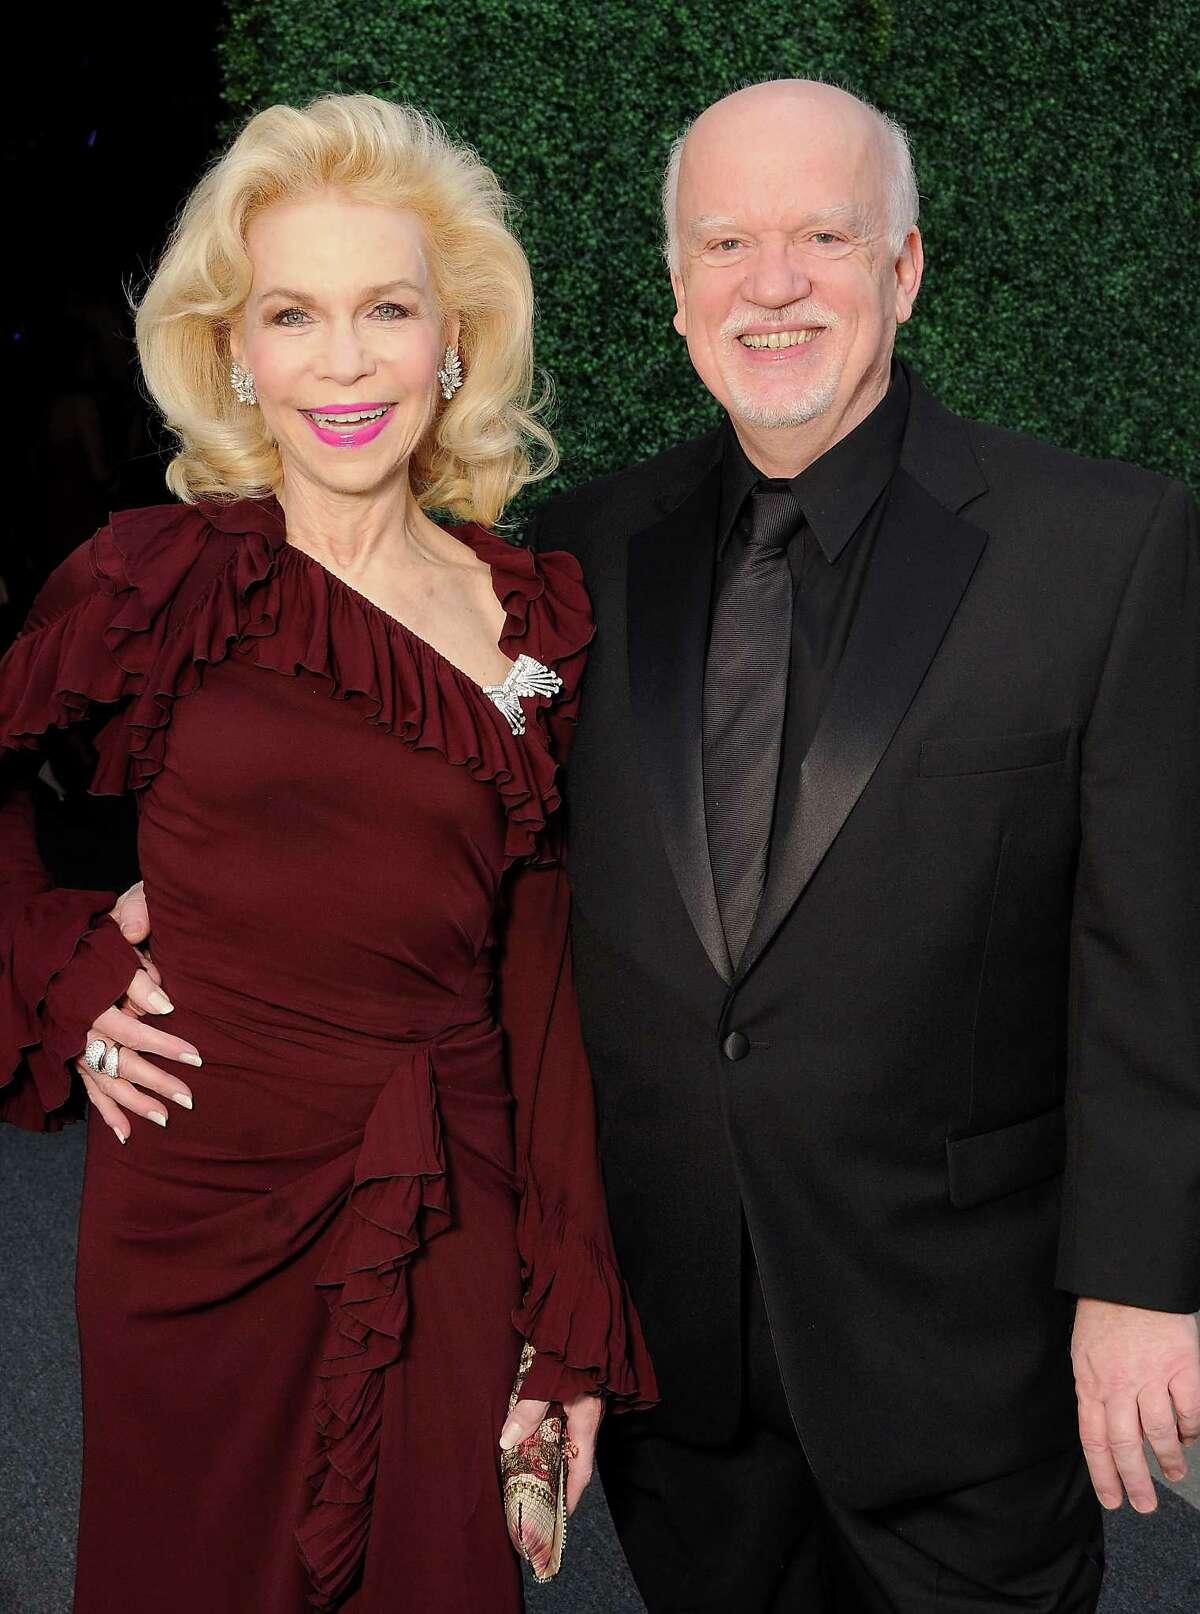 Lynn Wyatt and Gregory Boyd at the 2014 Alley Theatre Ball